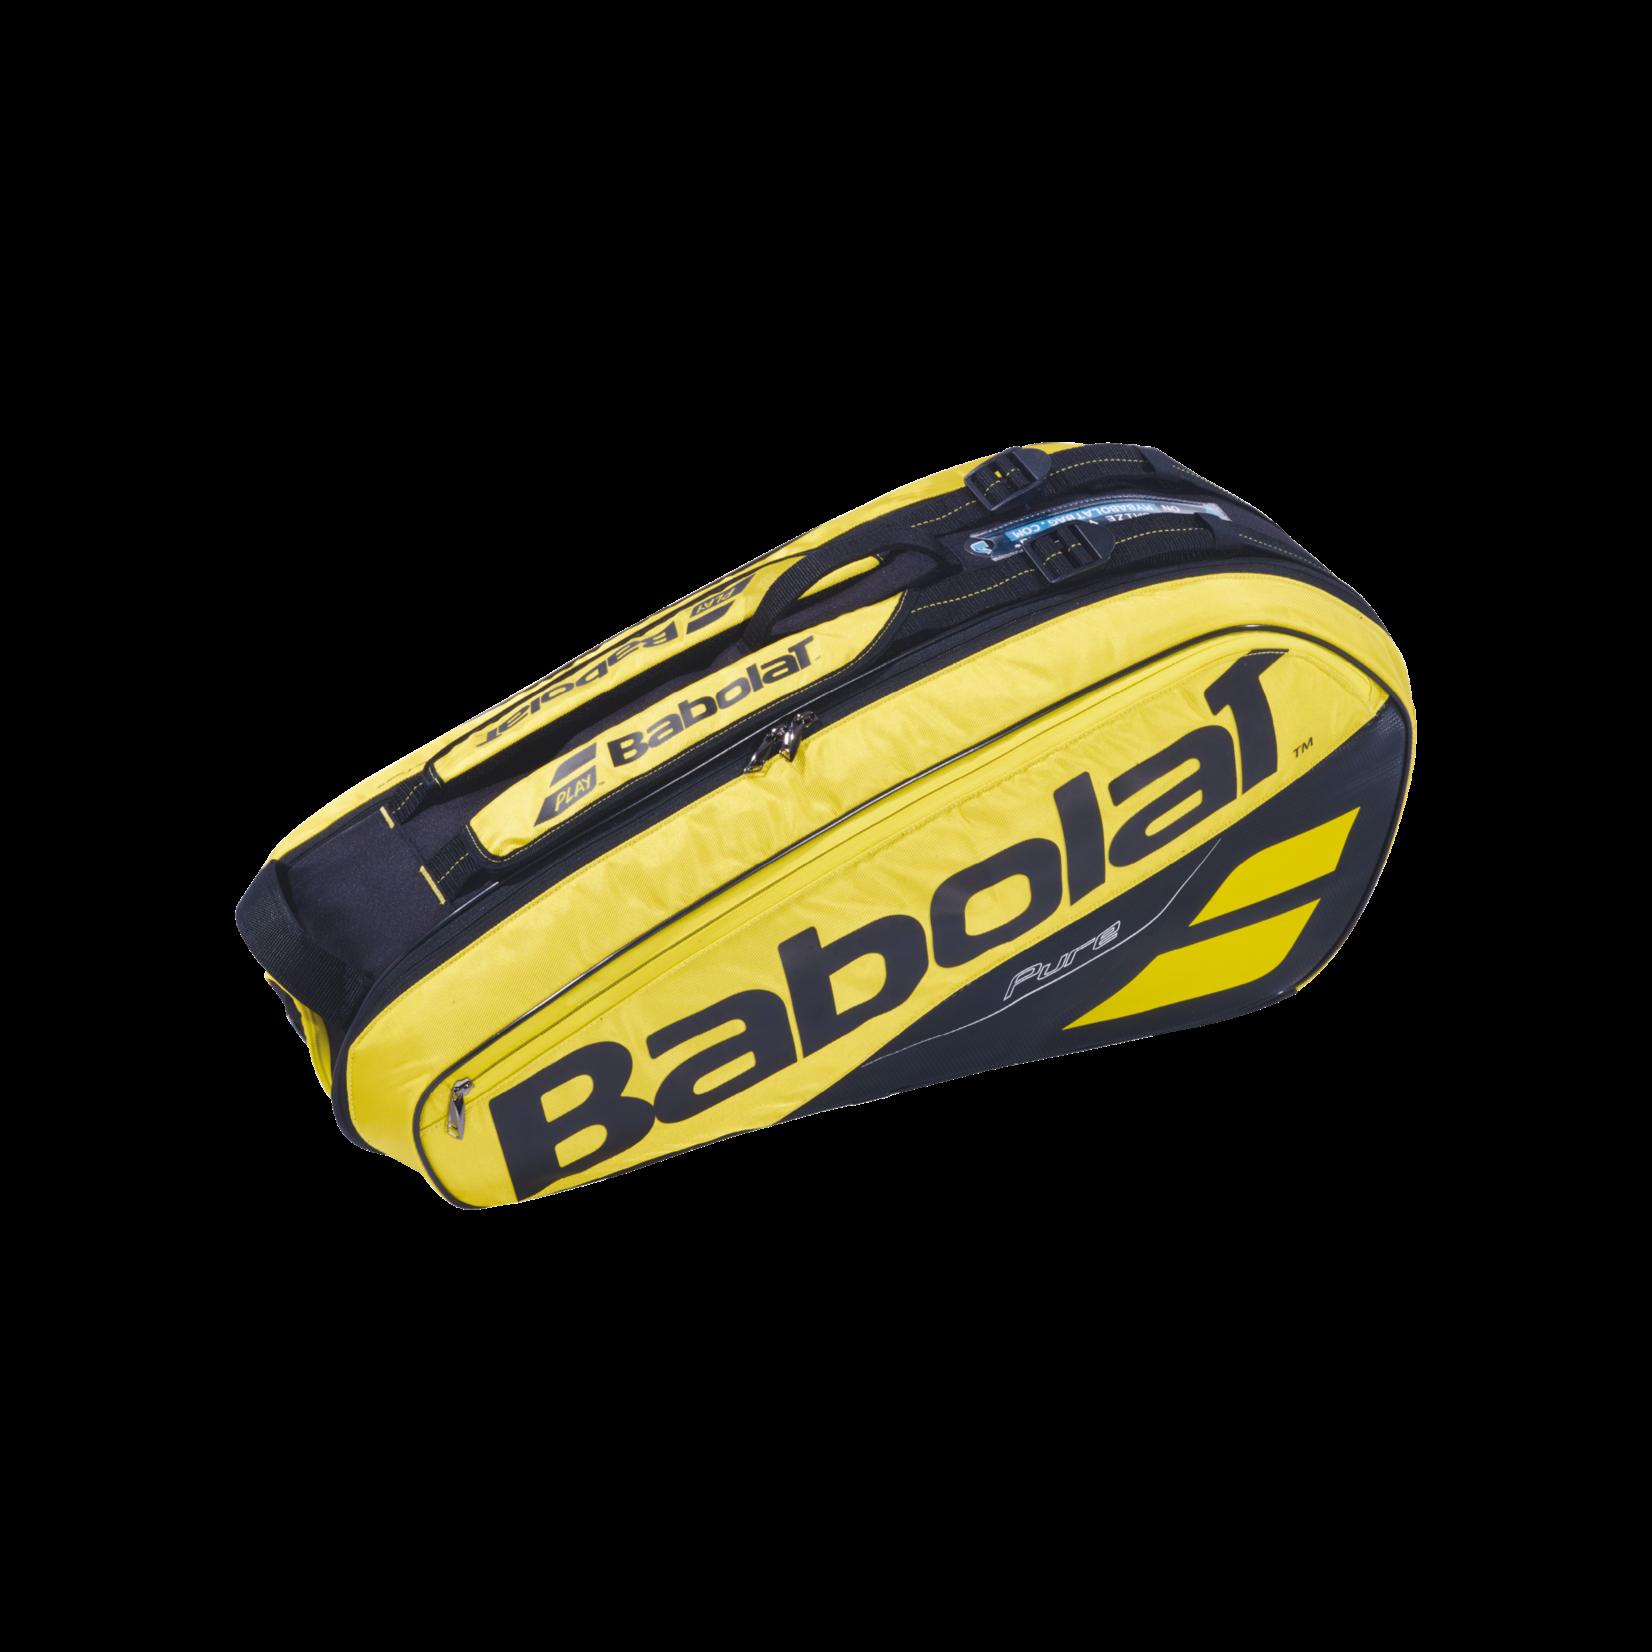 Babolat RH x6 Pure Aero